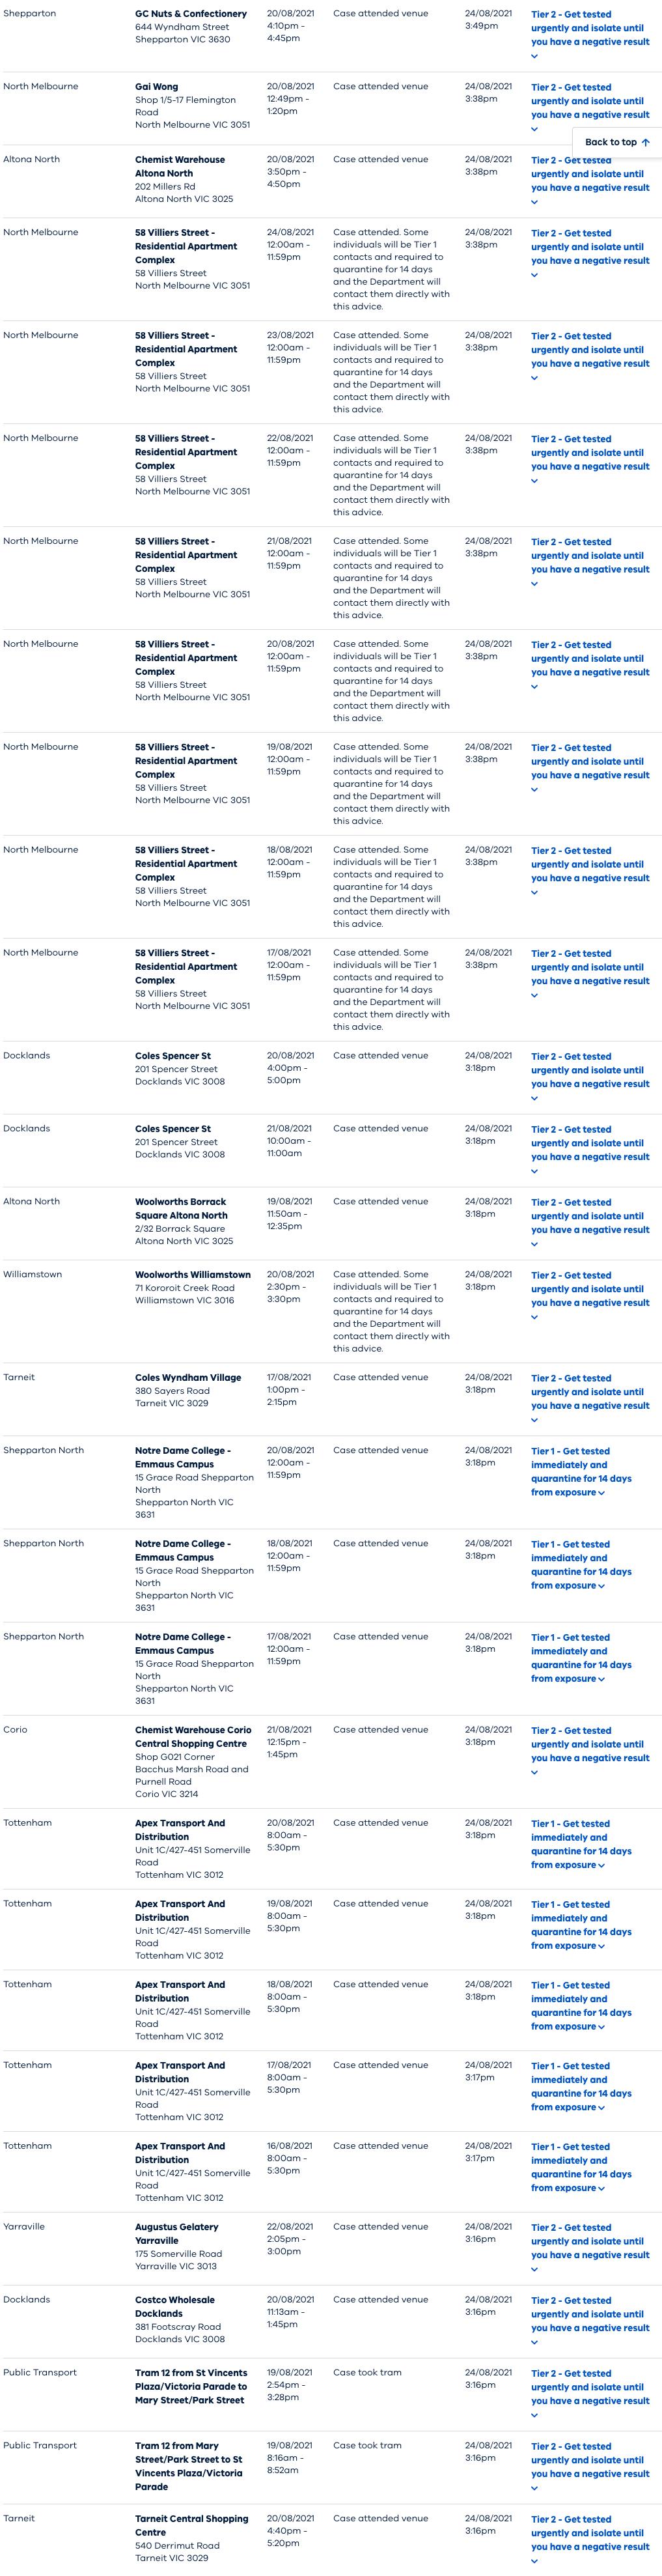 www.coronavirus.vic.gov.au_exposure-sites (2).png